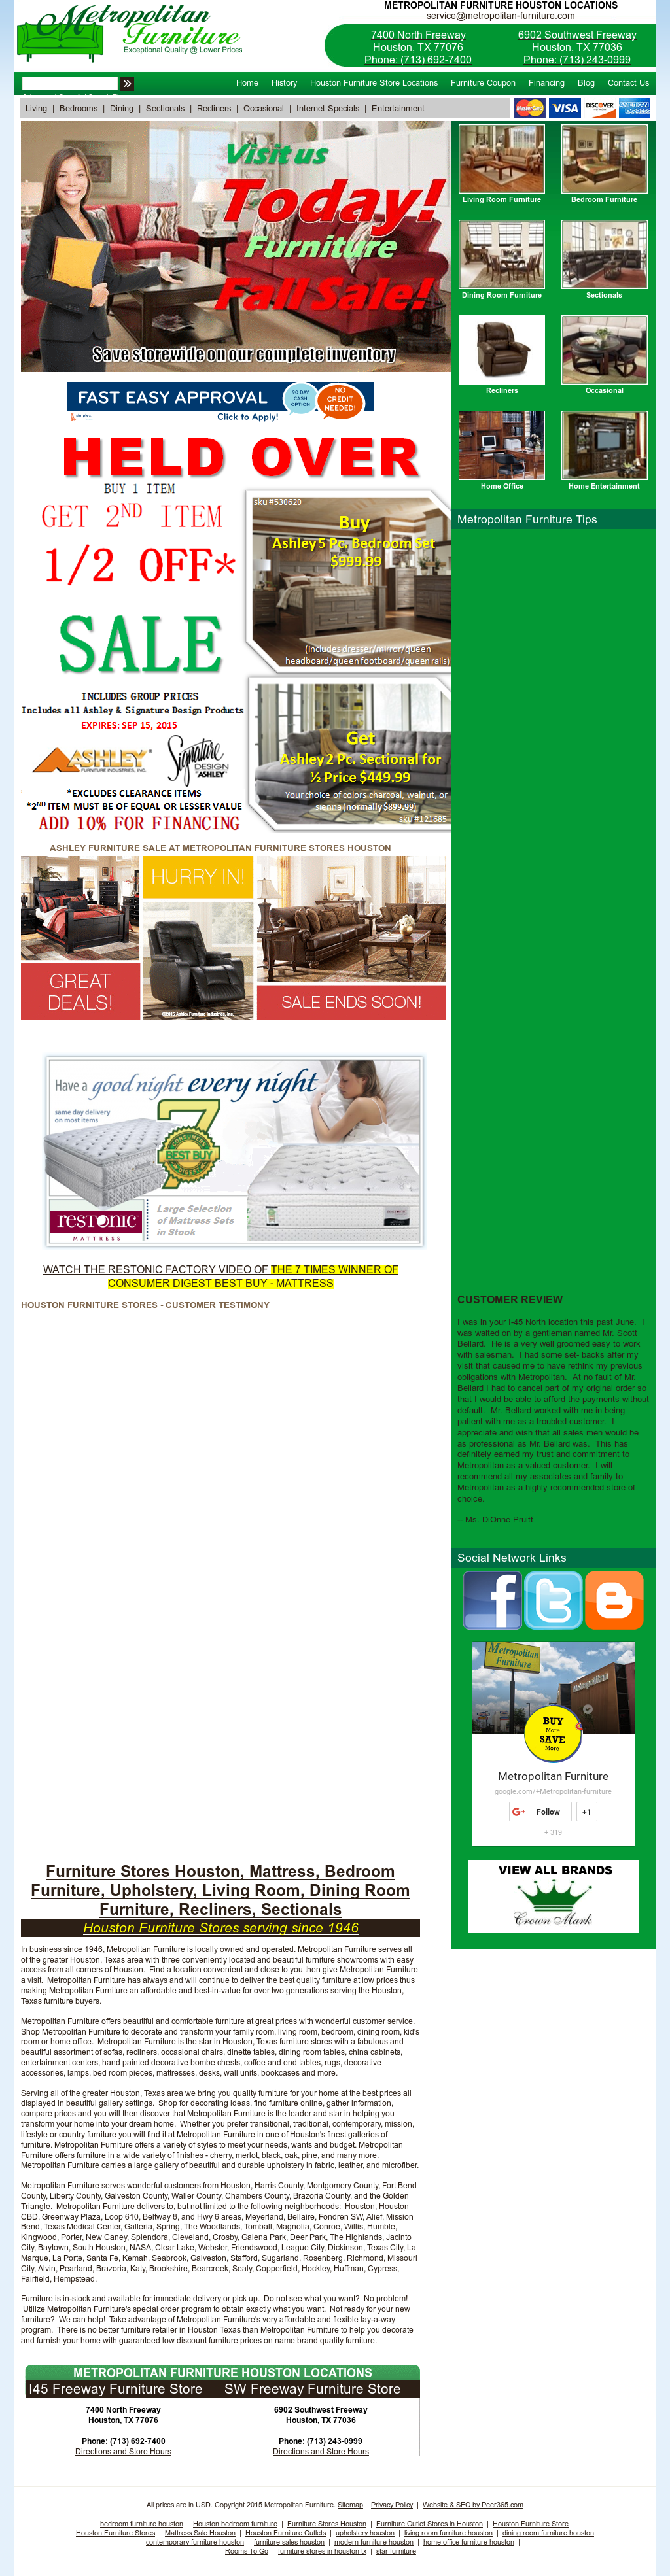 Metropolitan Furniture Website History